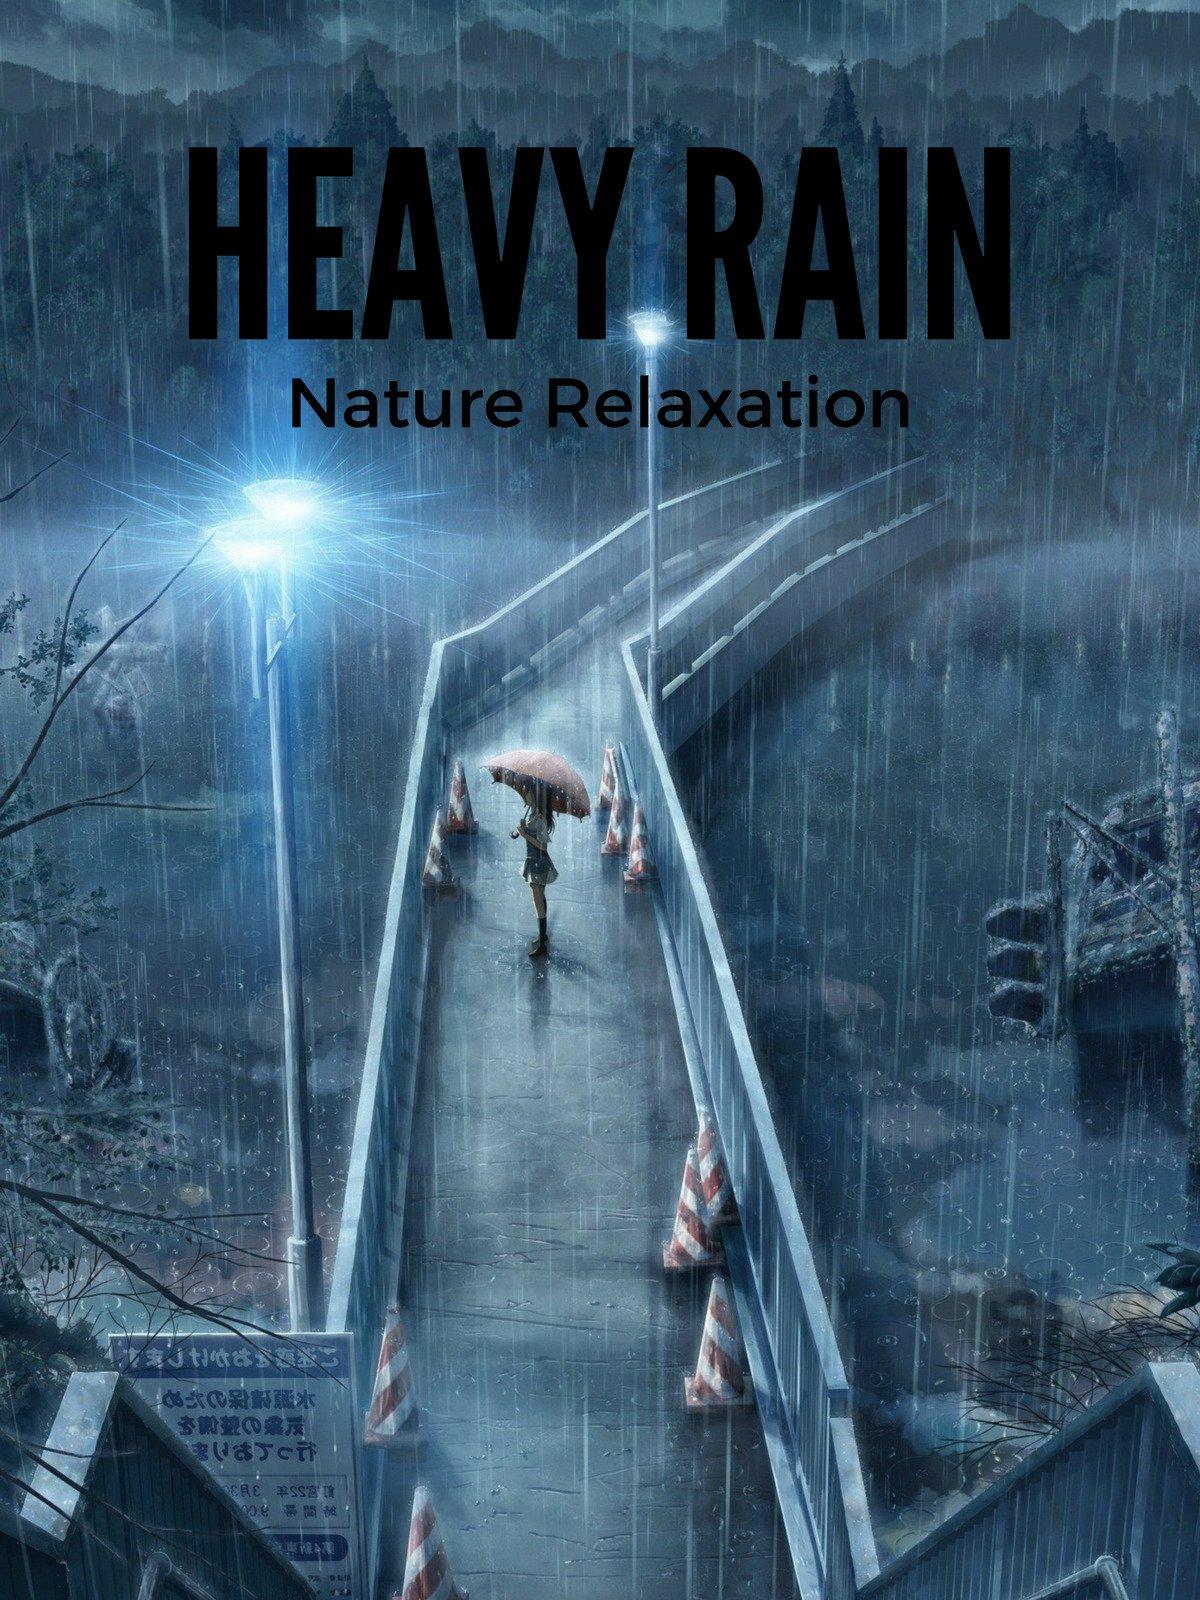 Heavy Rain Nature Relaxation